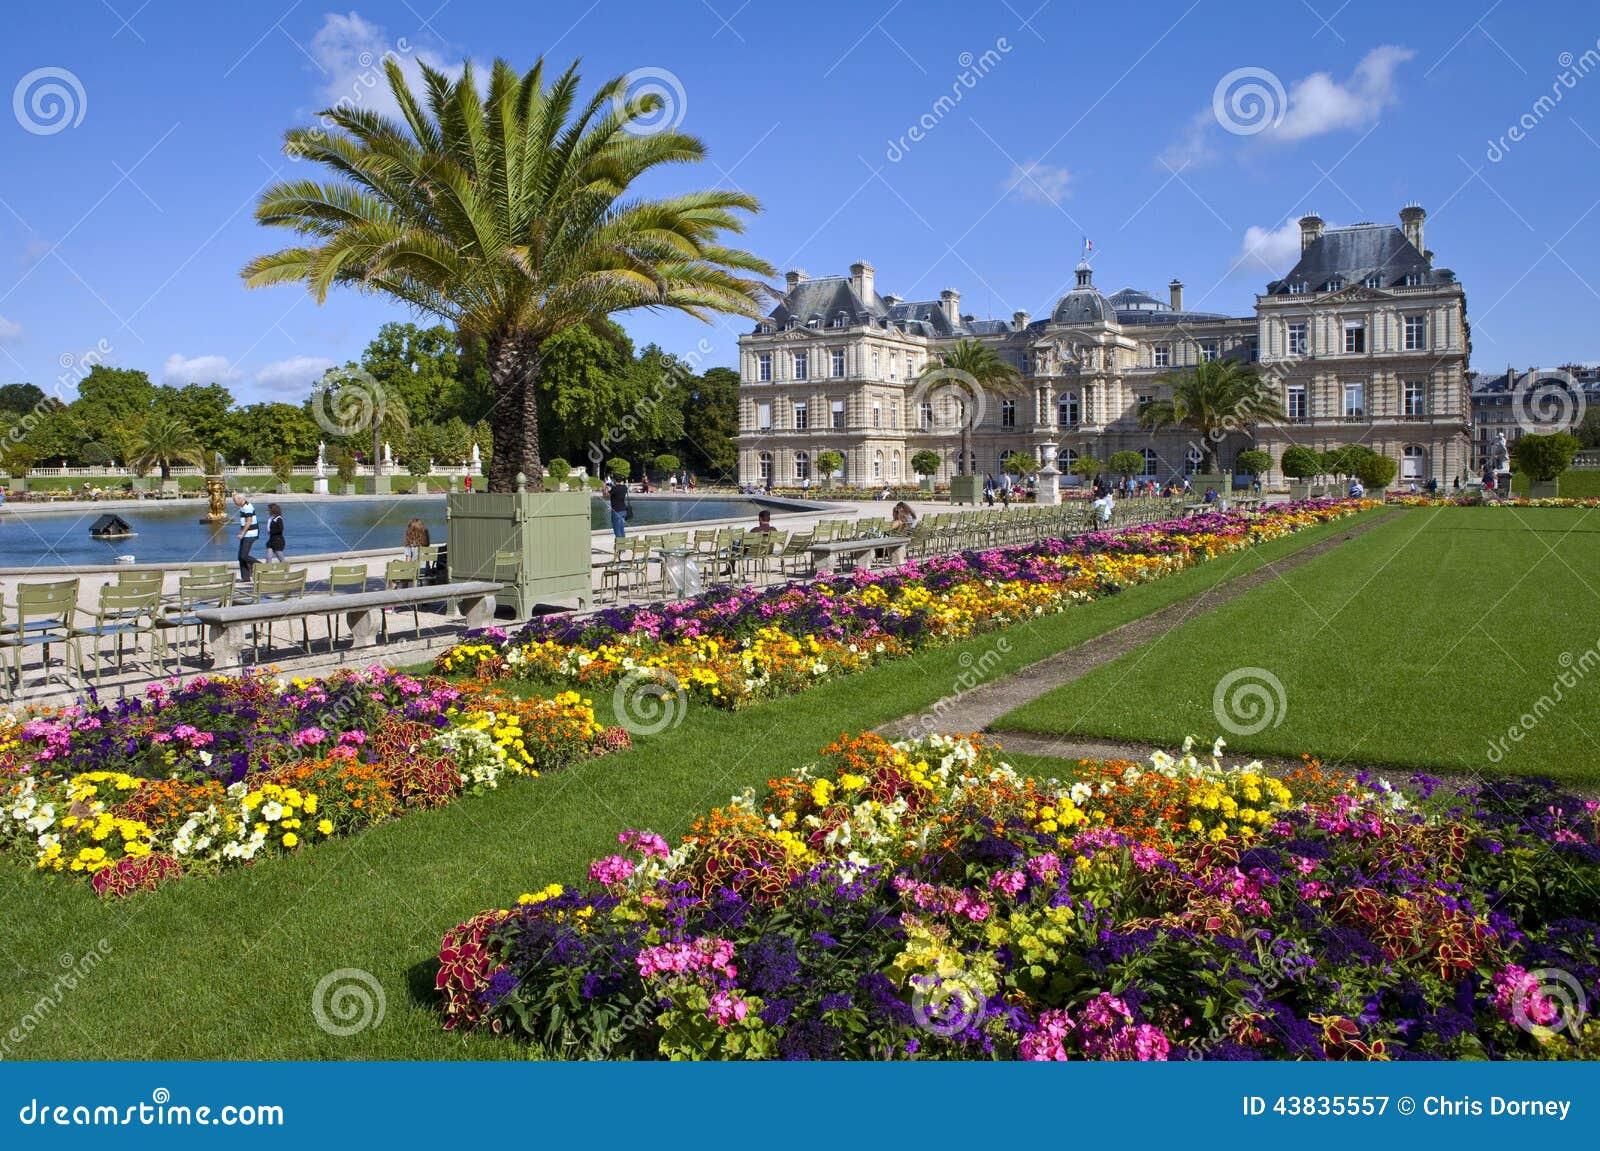 Luxemburg palast in jardin du luxemburg in paris for Grosartig grafgarten